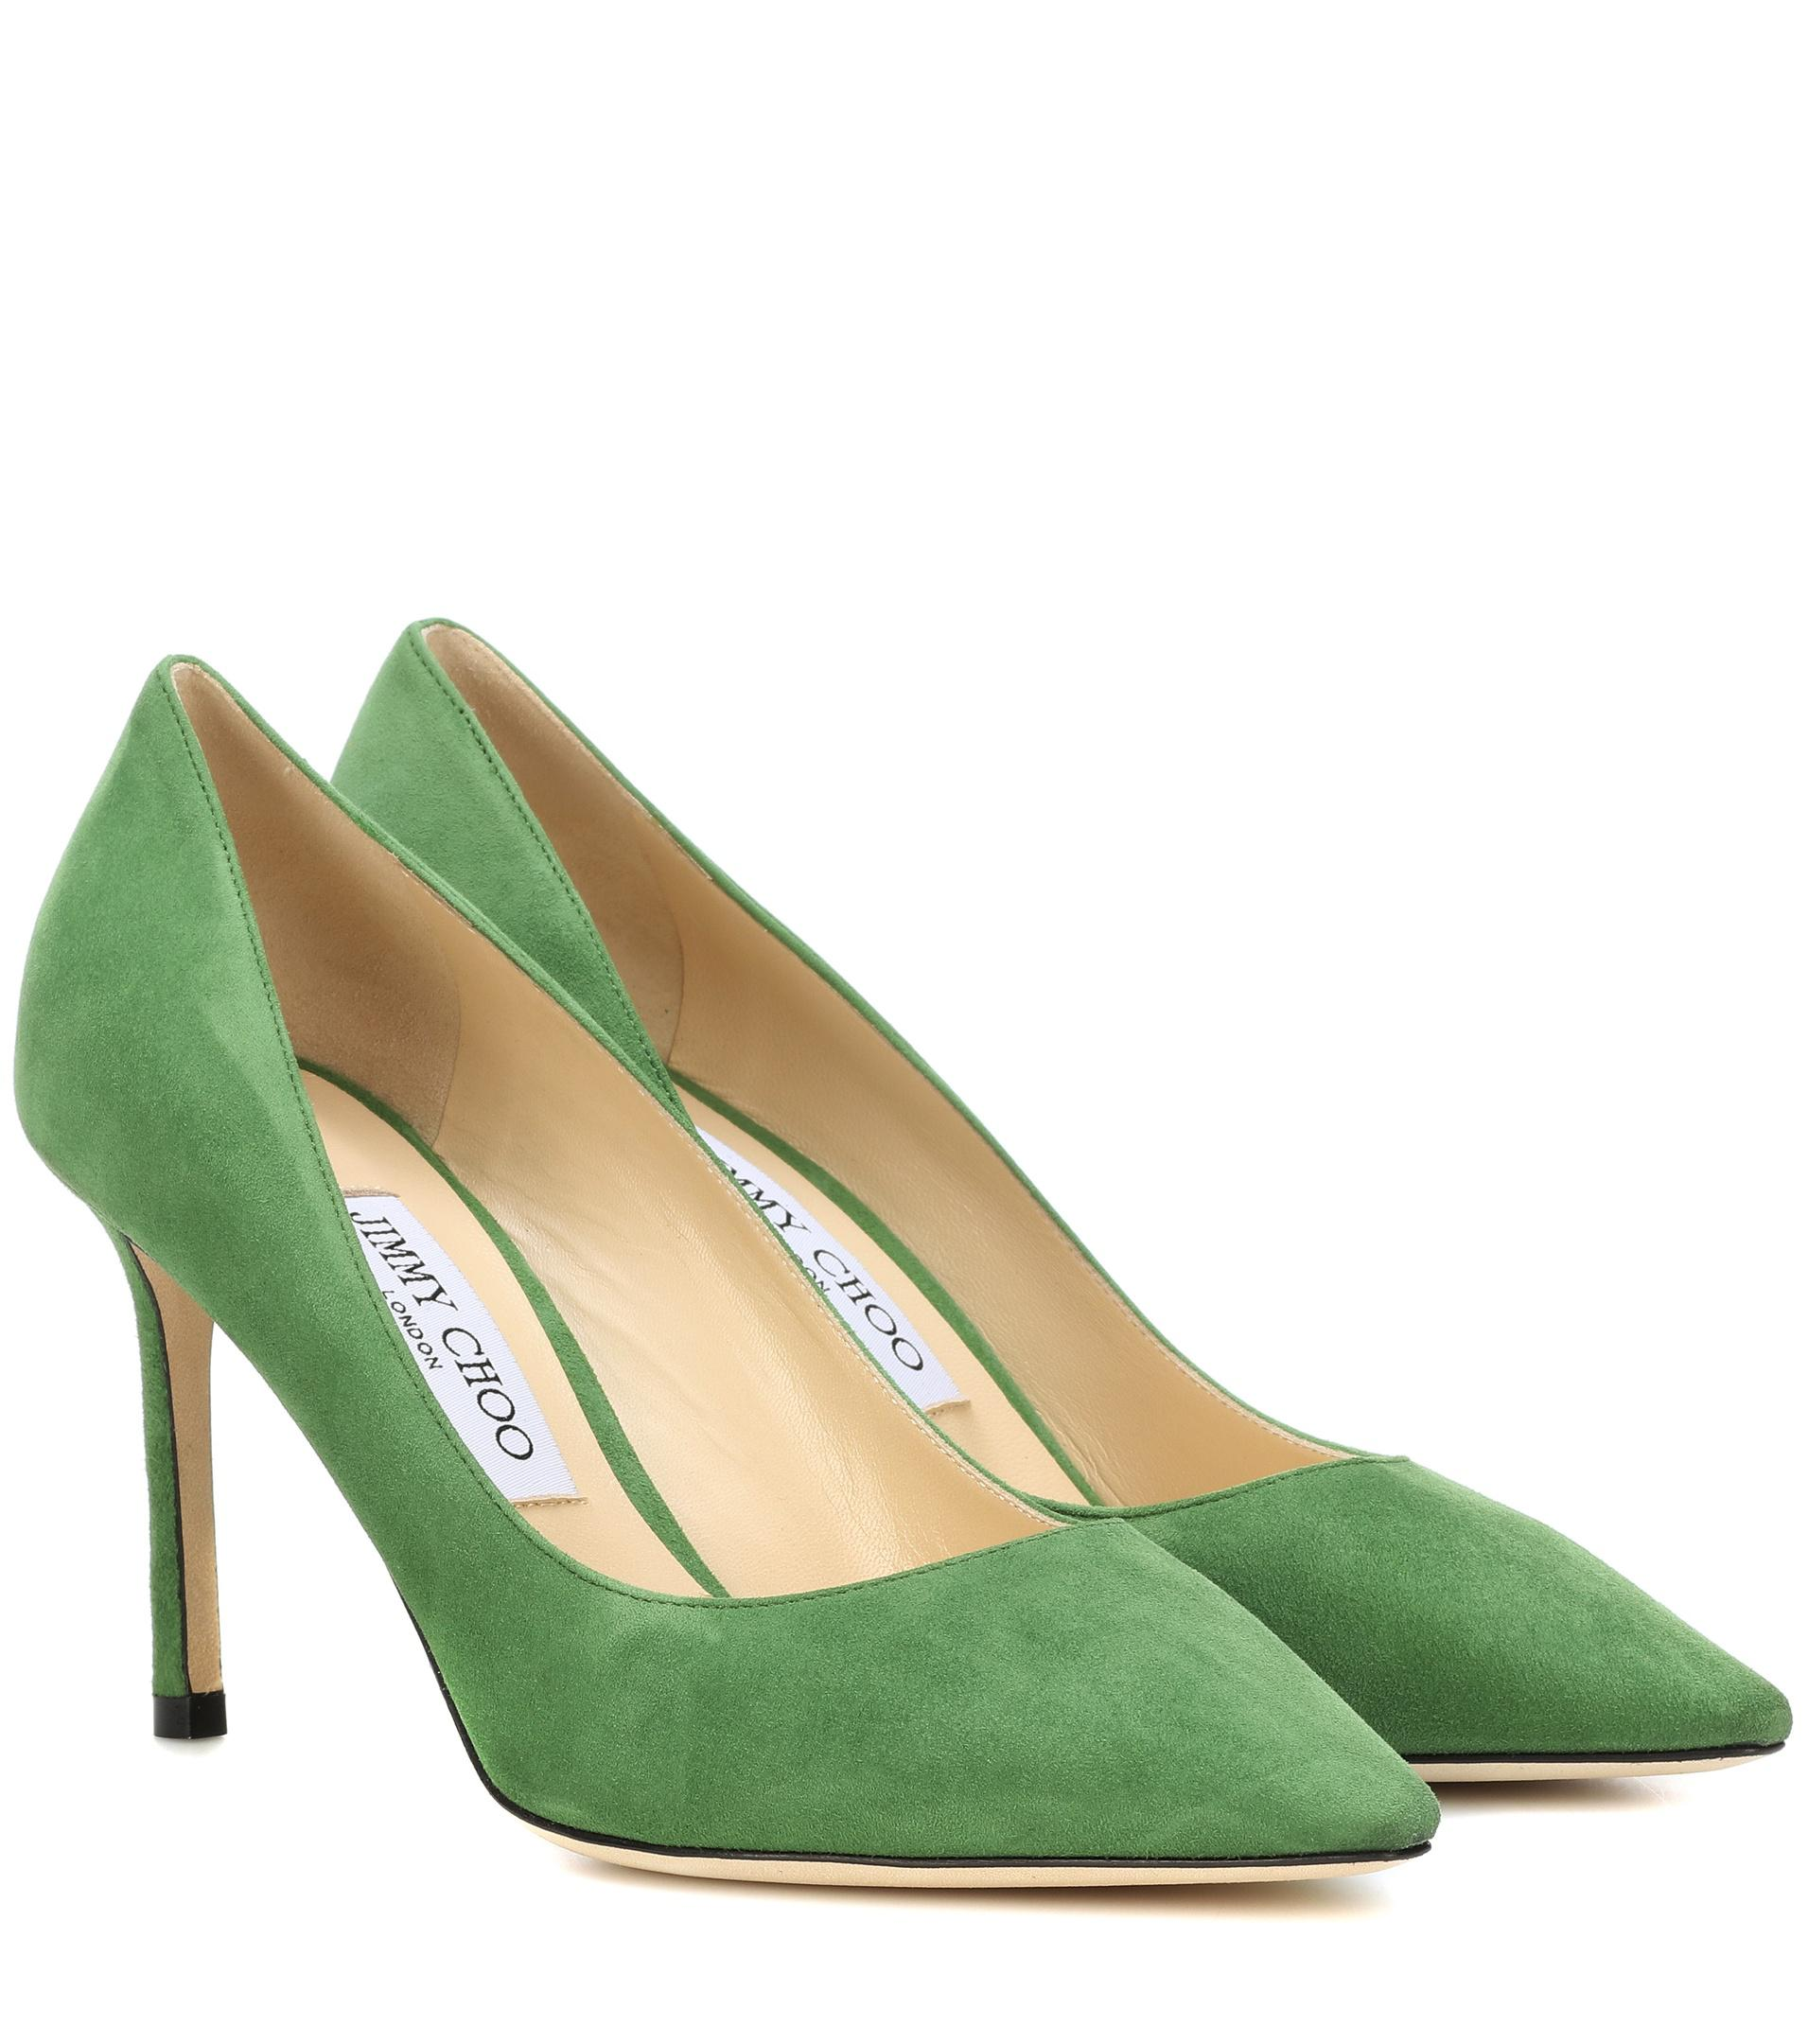 Romy 85 pumps - Green Jimmy Choo London ld4Fh1r5j2